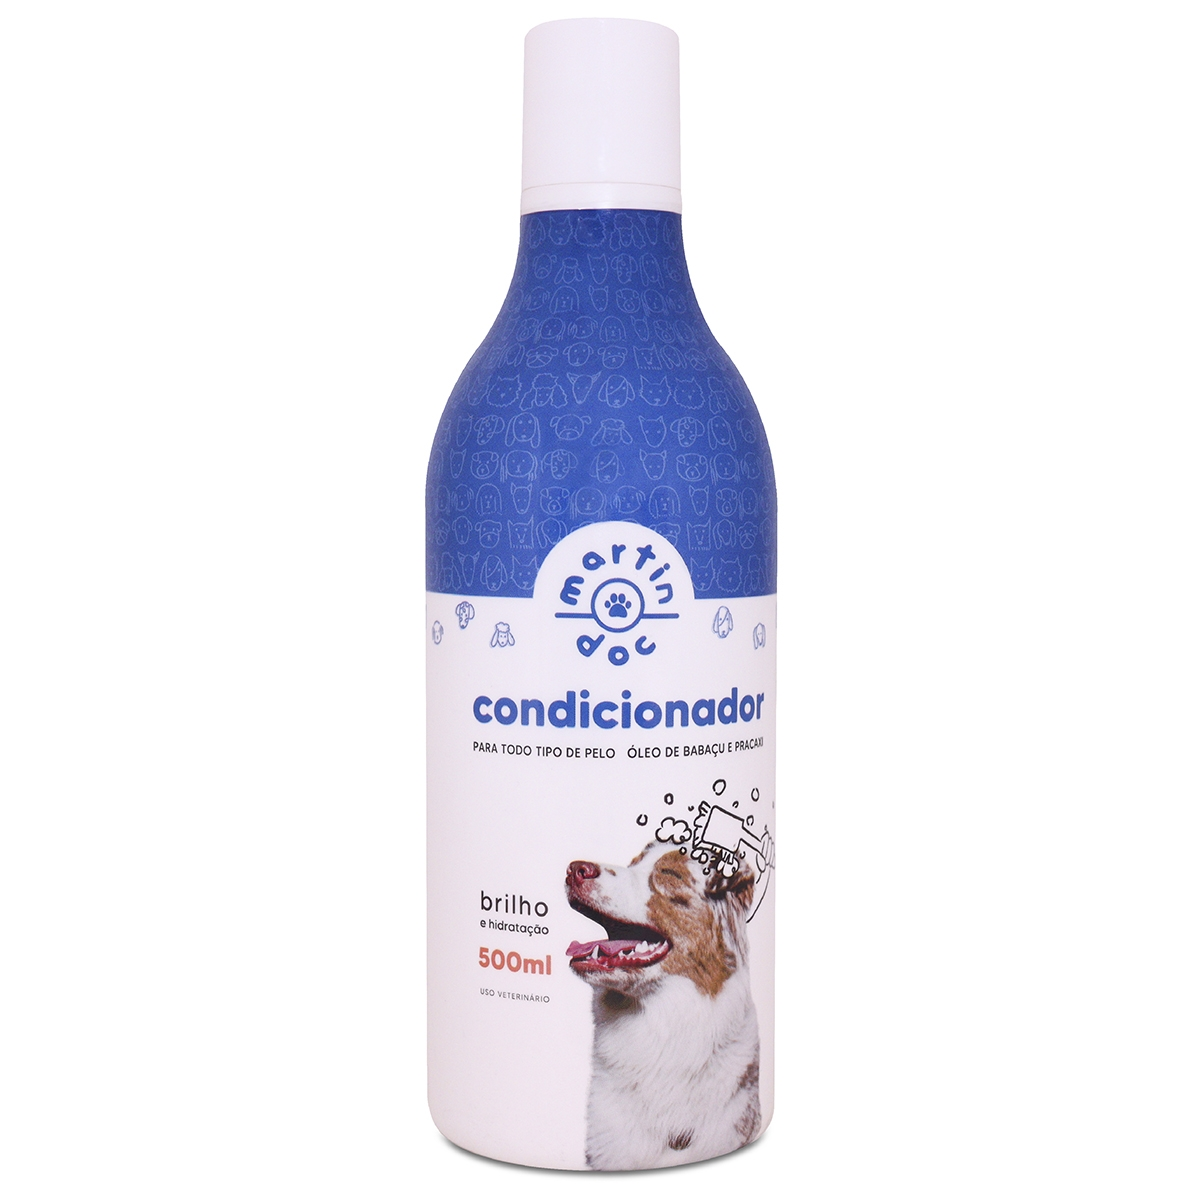 Condicionador Martindoc 500 ml